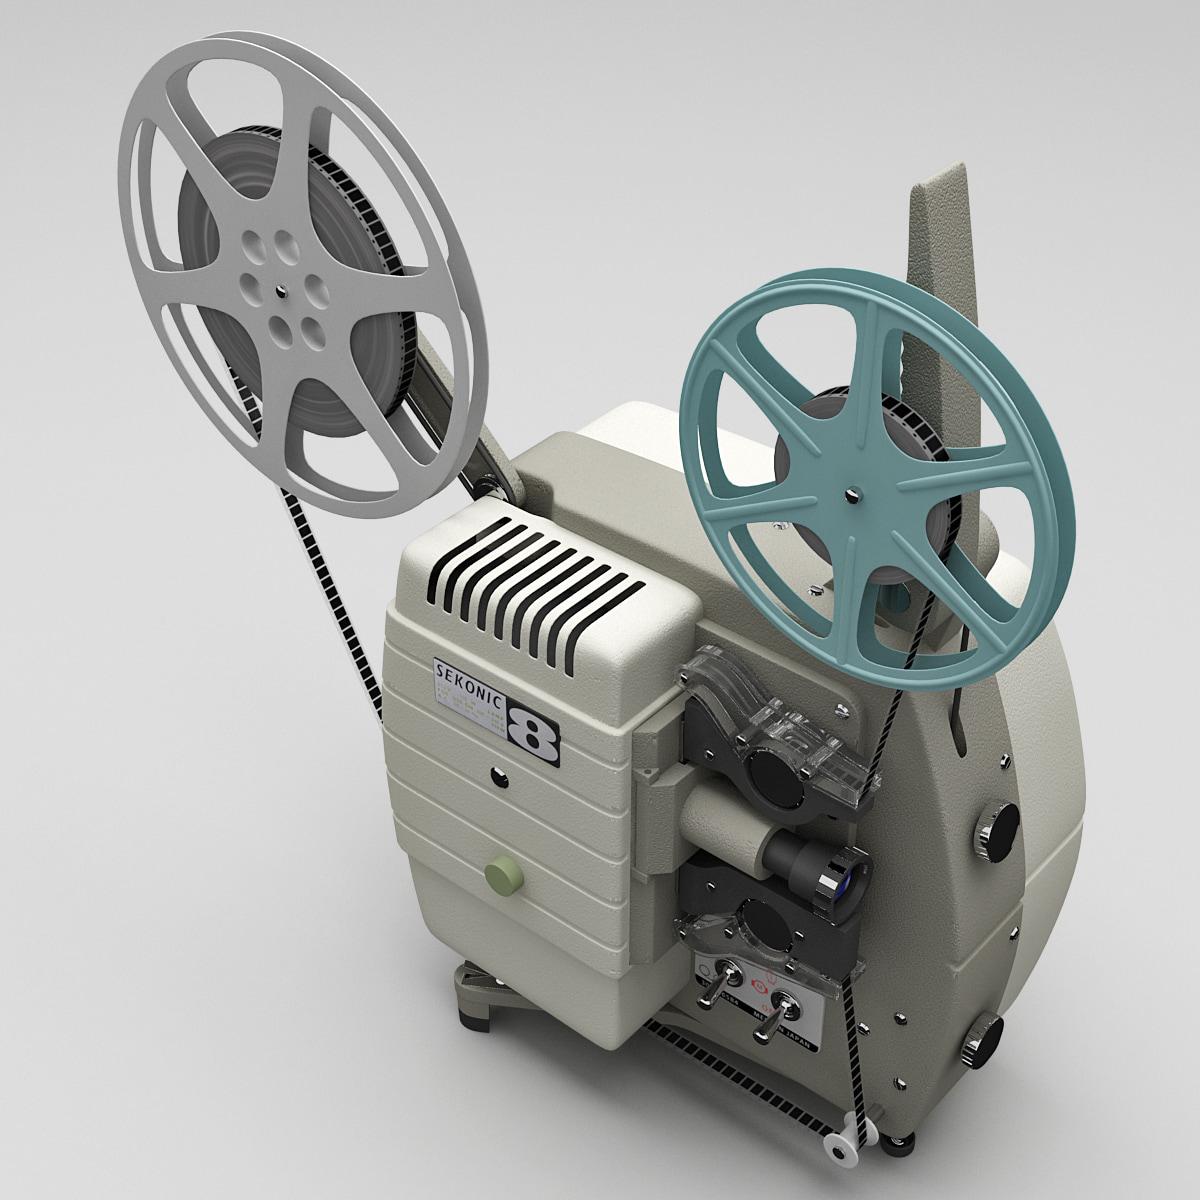 Vintage_Projector_Sekonic_Model_30C_8mm_0001.jpg